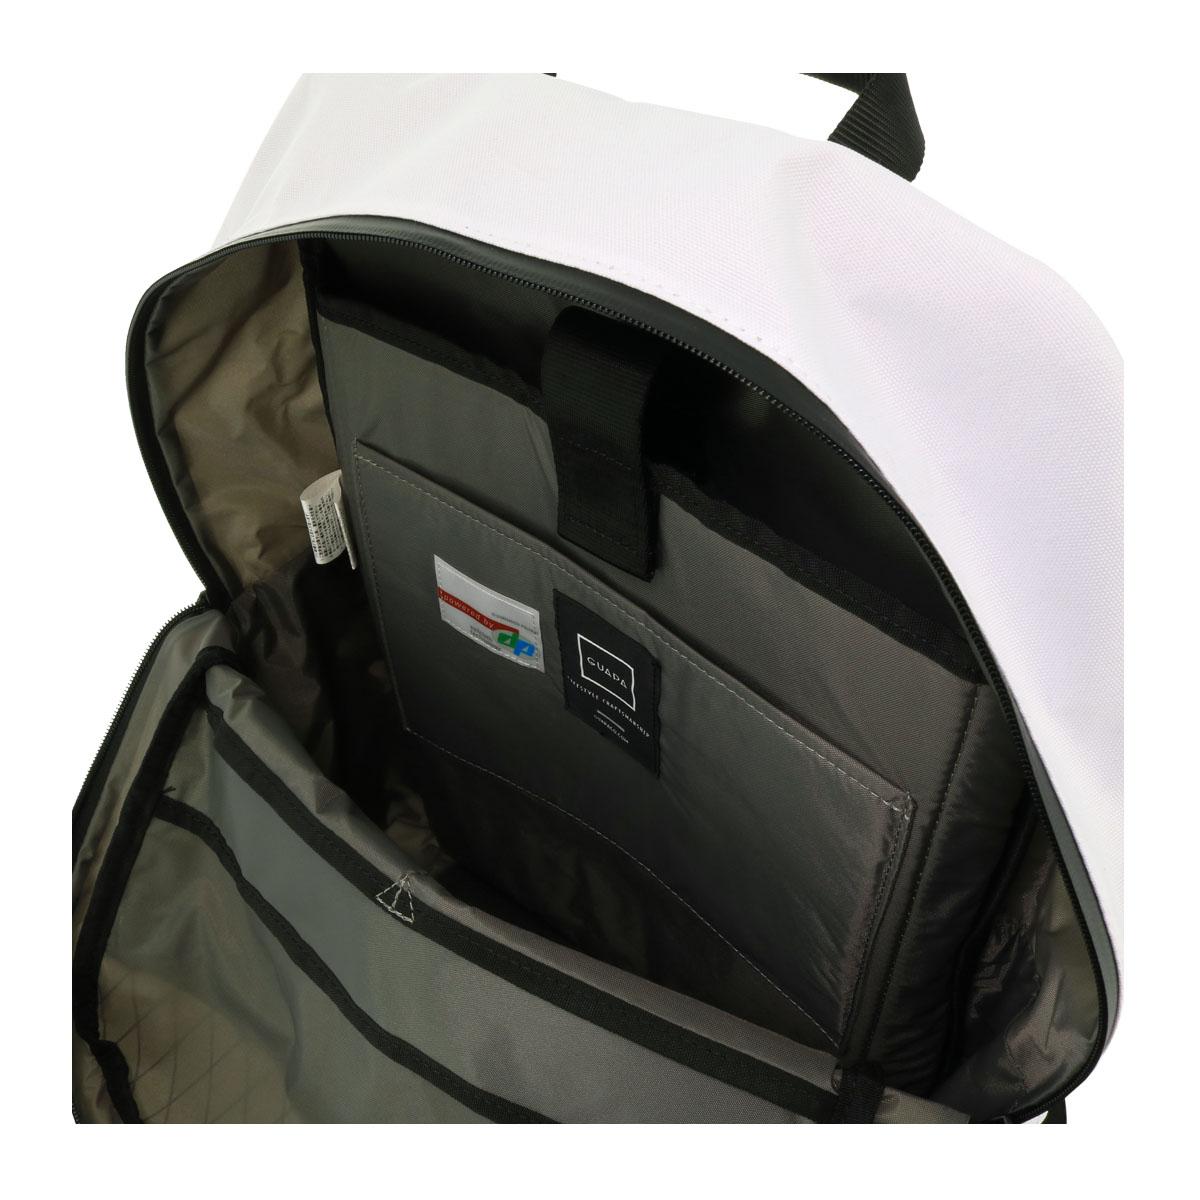 51000 GUAPA リュックサック エックス [PO10] リュック レディース グアパ 18L   メンズ [bef] バックパック 軽量 防水